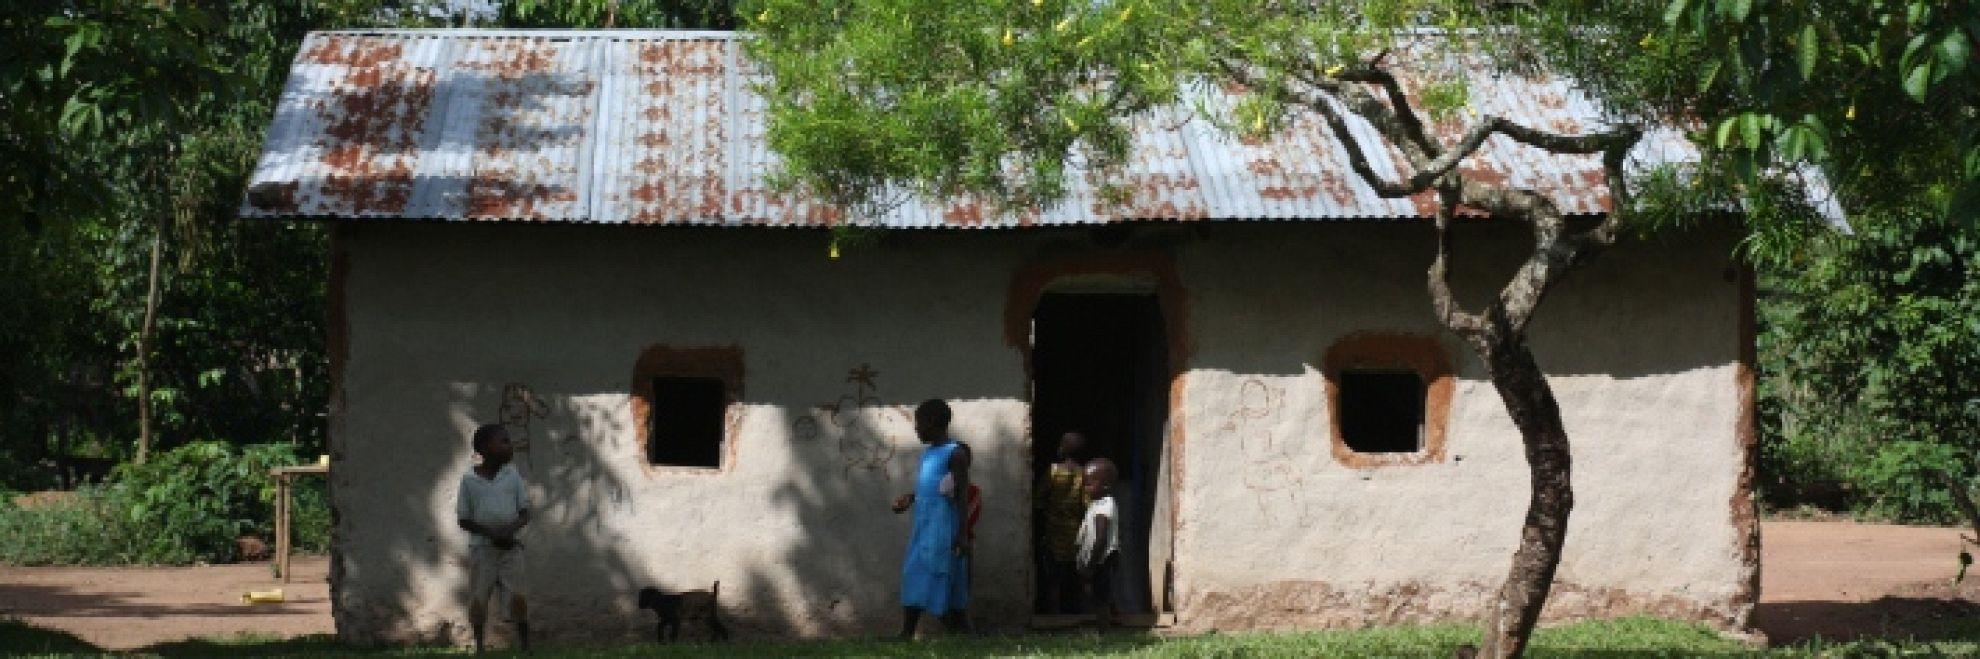 Latest News Fighting malaria on the ground